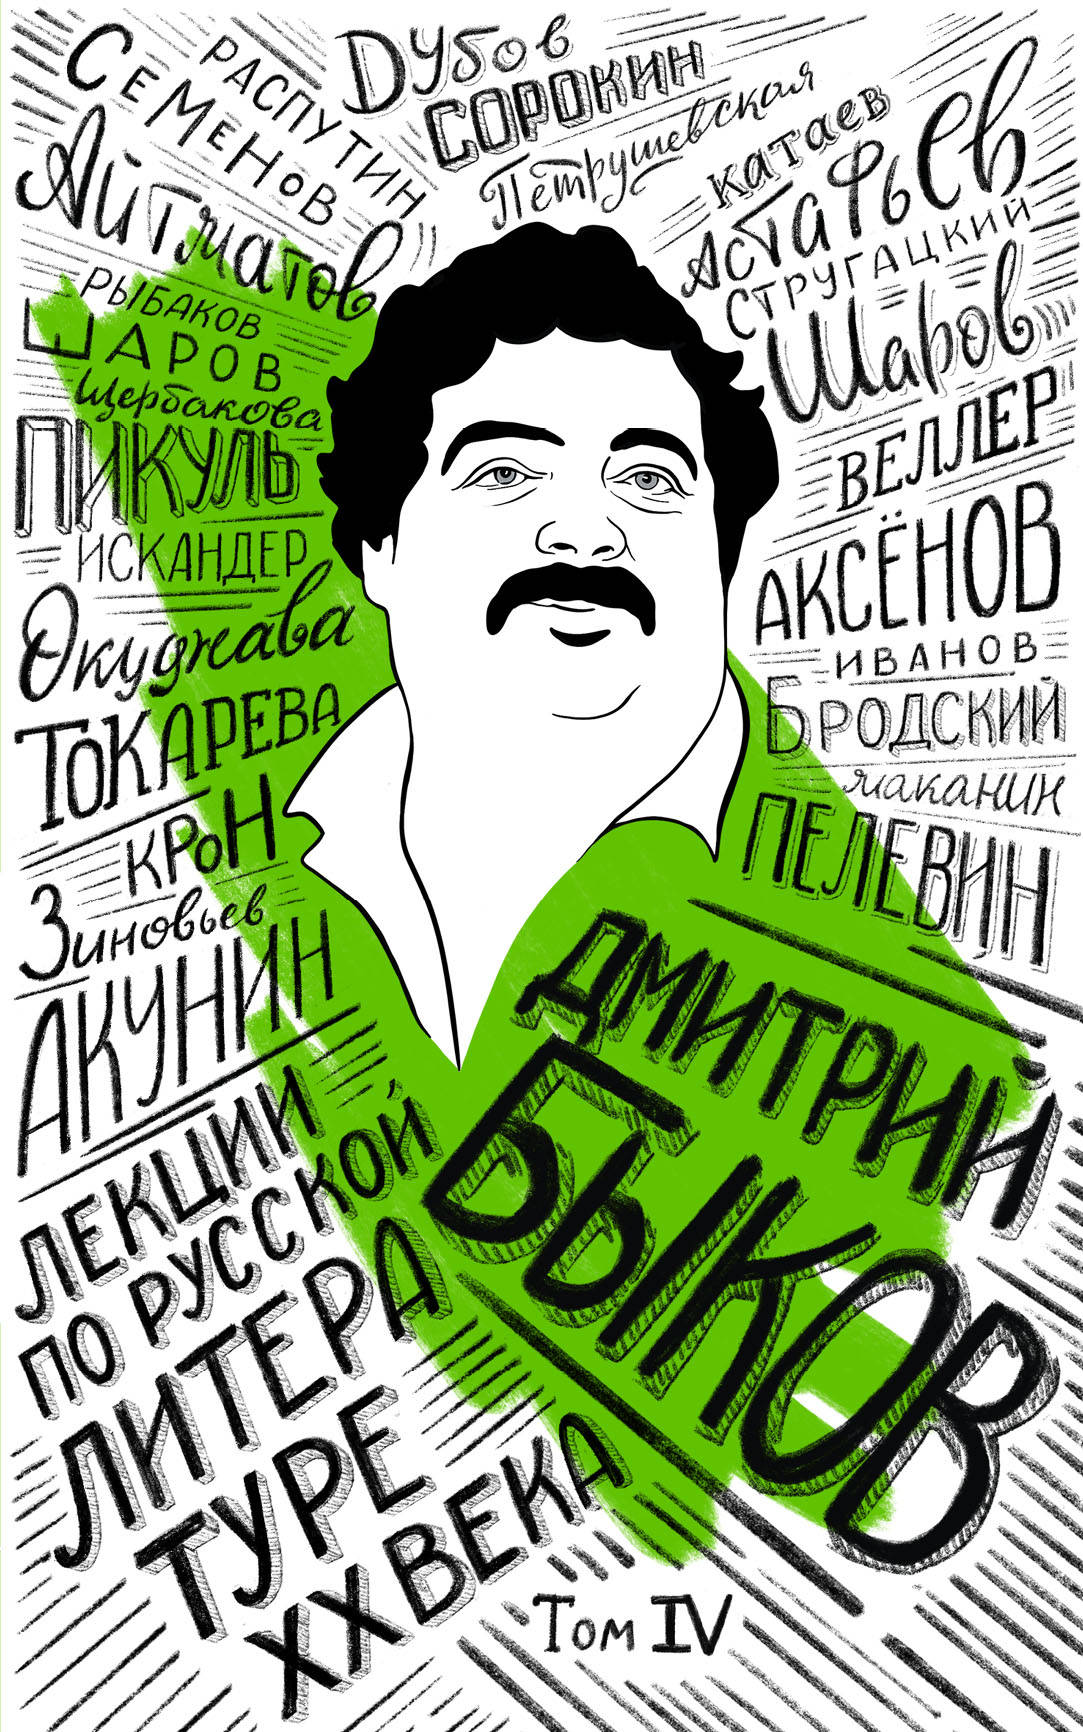 Lektsii po russkoj literature XX veka. Tom 4 (Zelenyj)